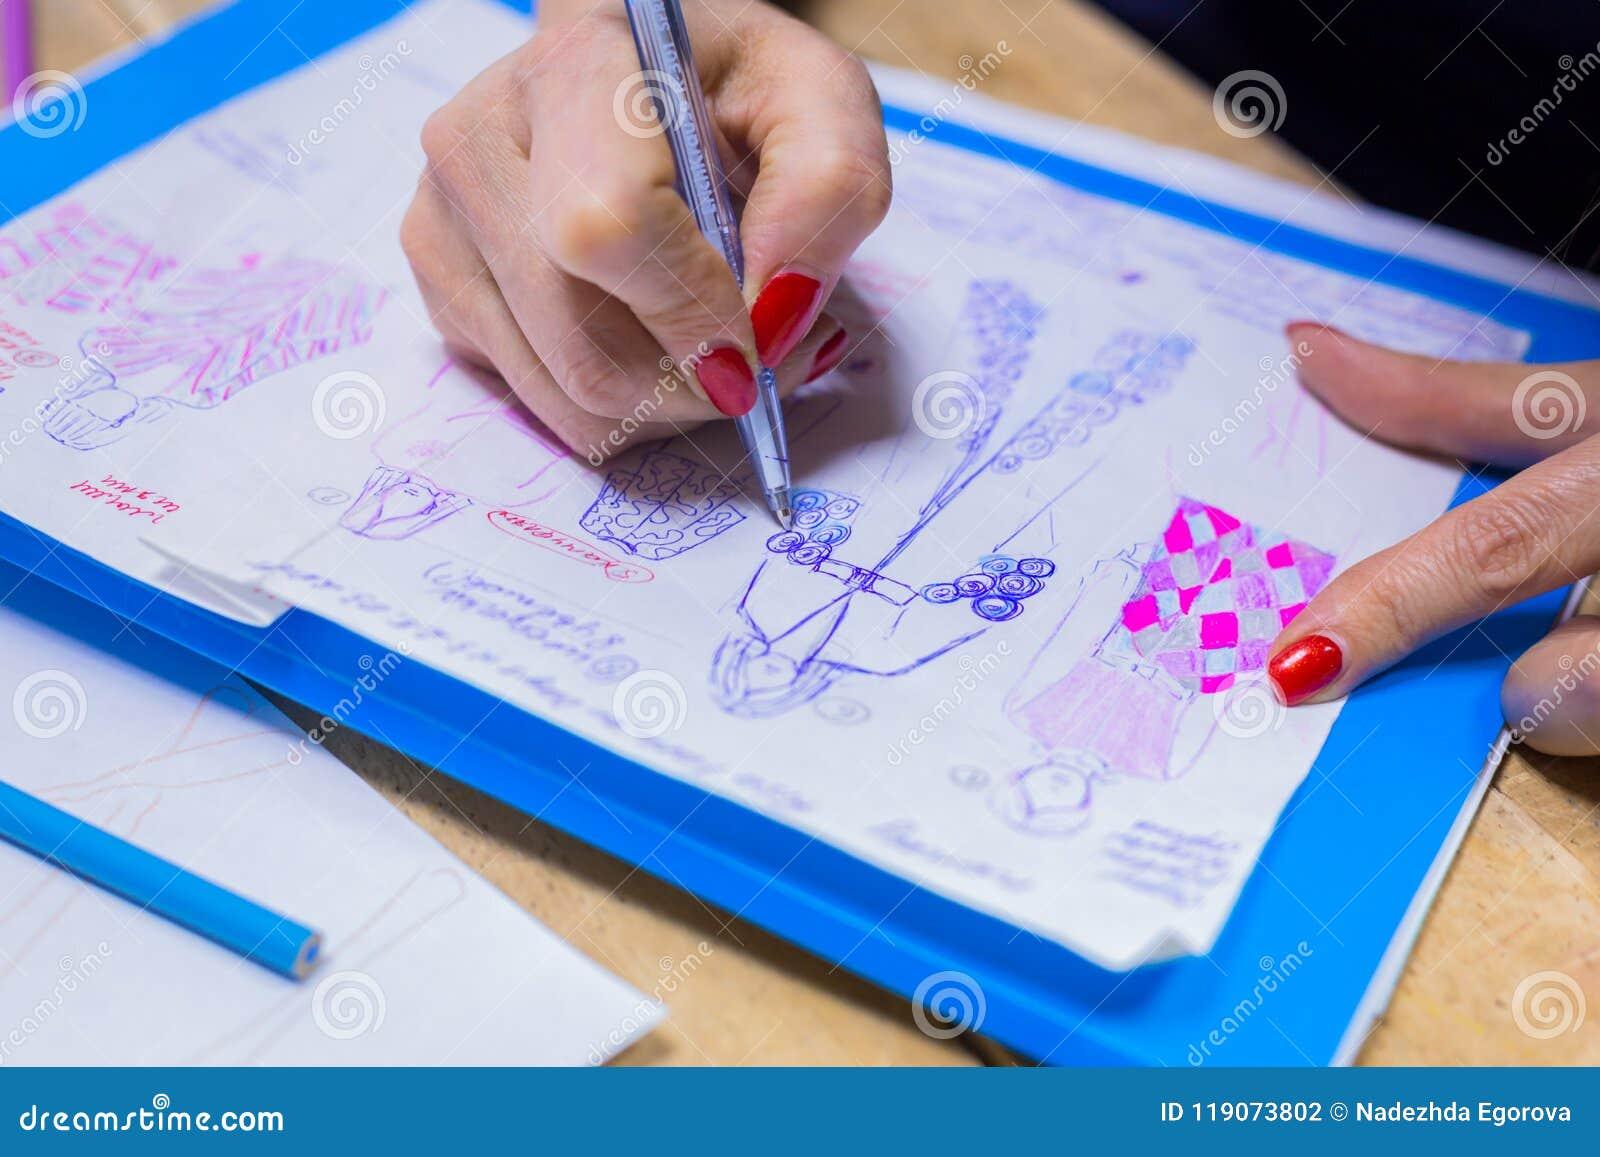 Fashion Designer Drawing Design Sketch Stock Photo Image Of Making Occupation 119073802